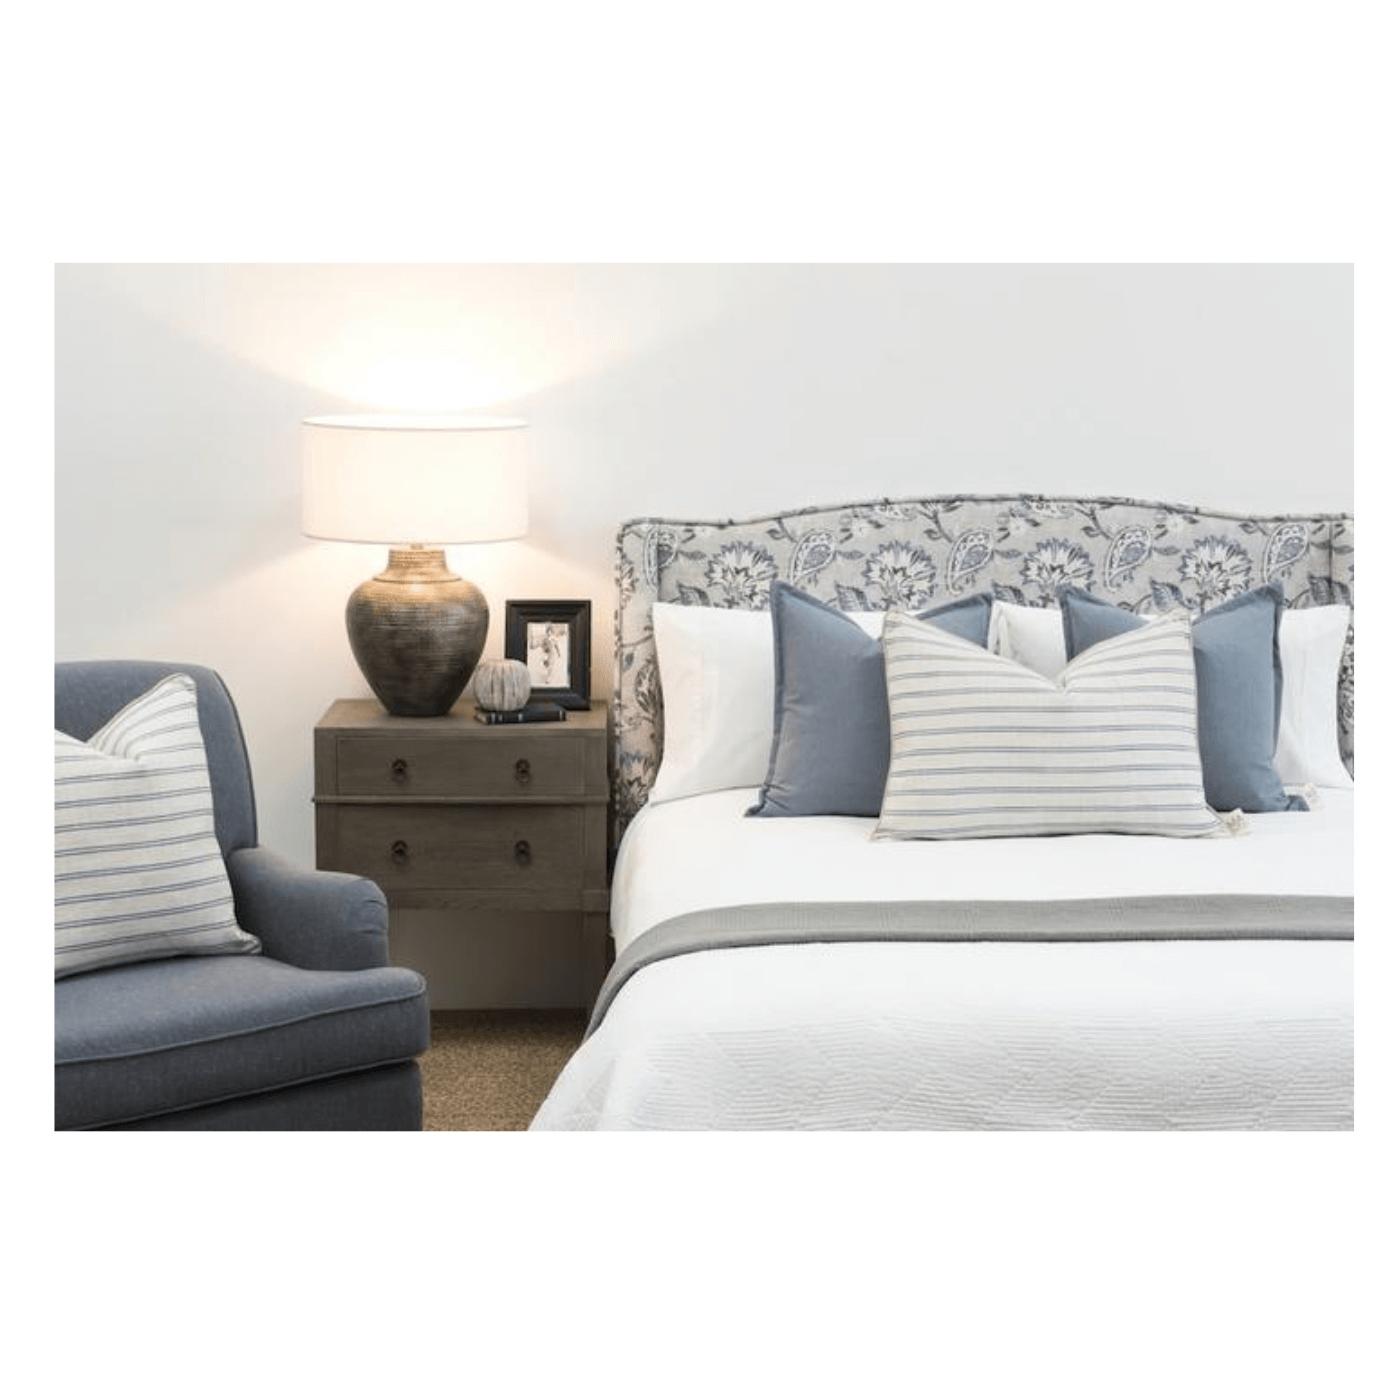 Two-Design-Lovers-Mayvn Interiors Lennox Bedhead Seraphine KING